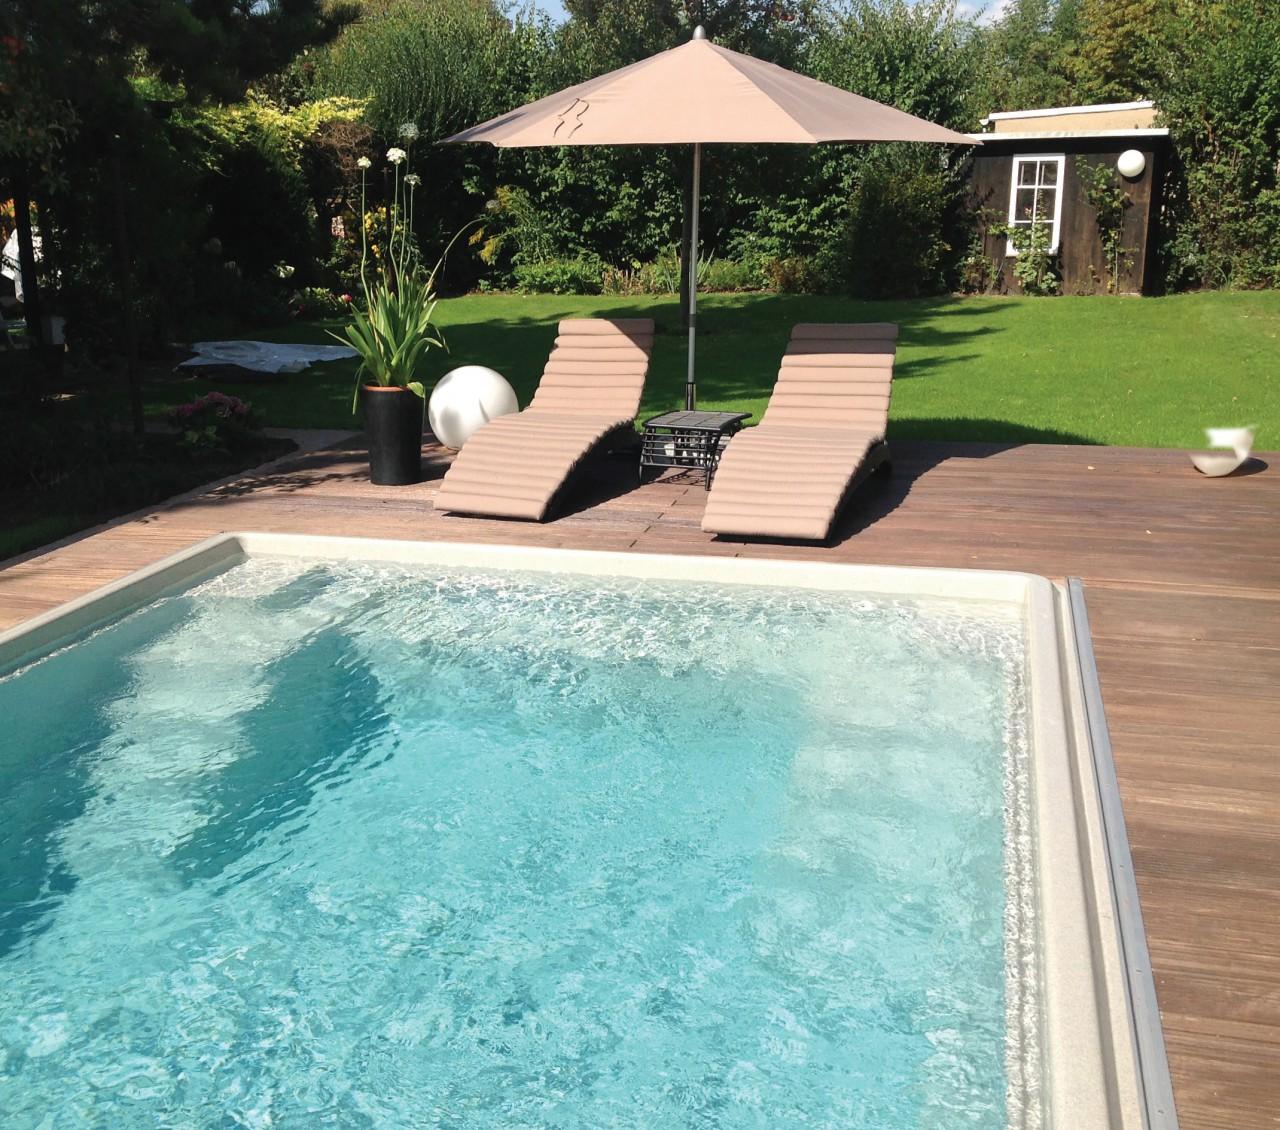 Aktionsbecken Carbon-Ceramic-Pool Elegant | Fkb Schwimmbadtechnik